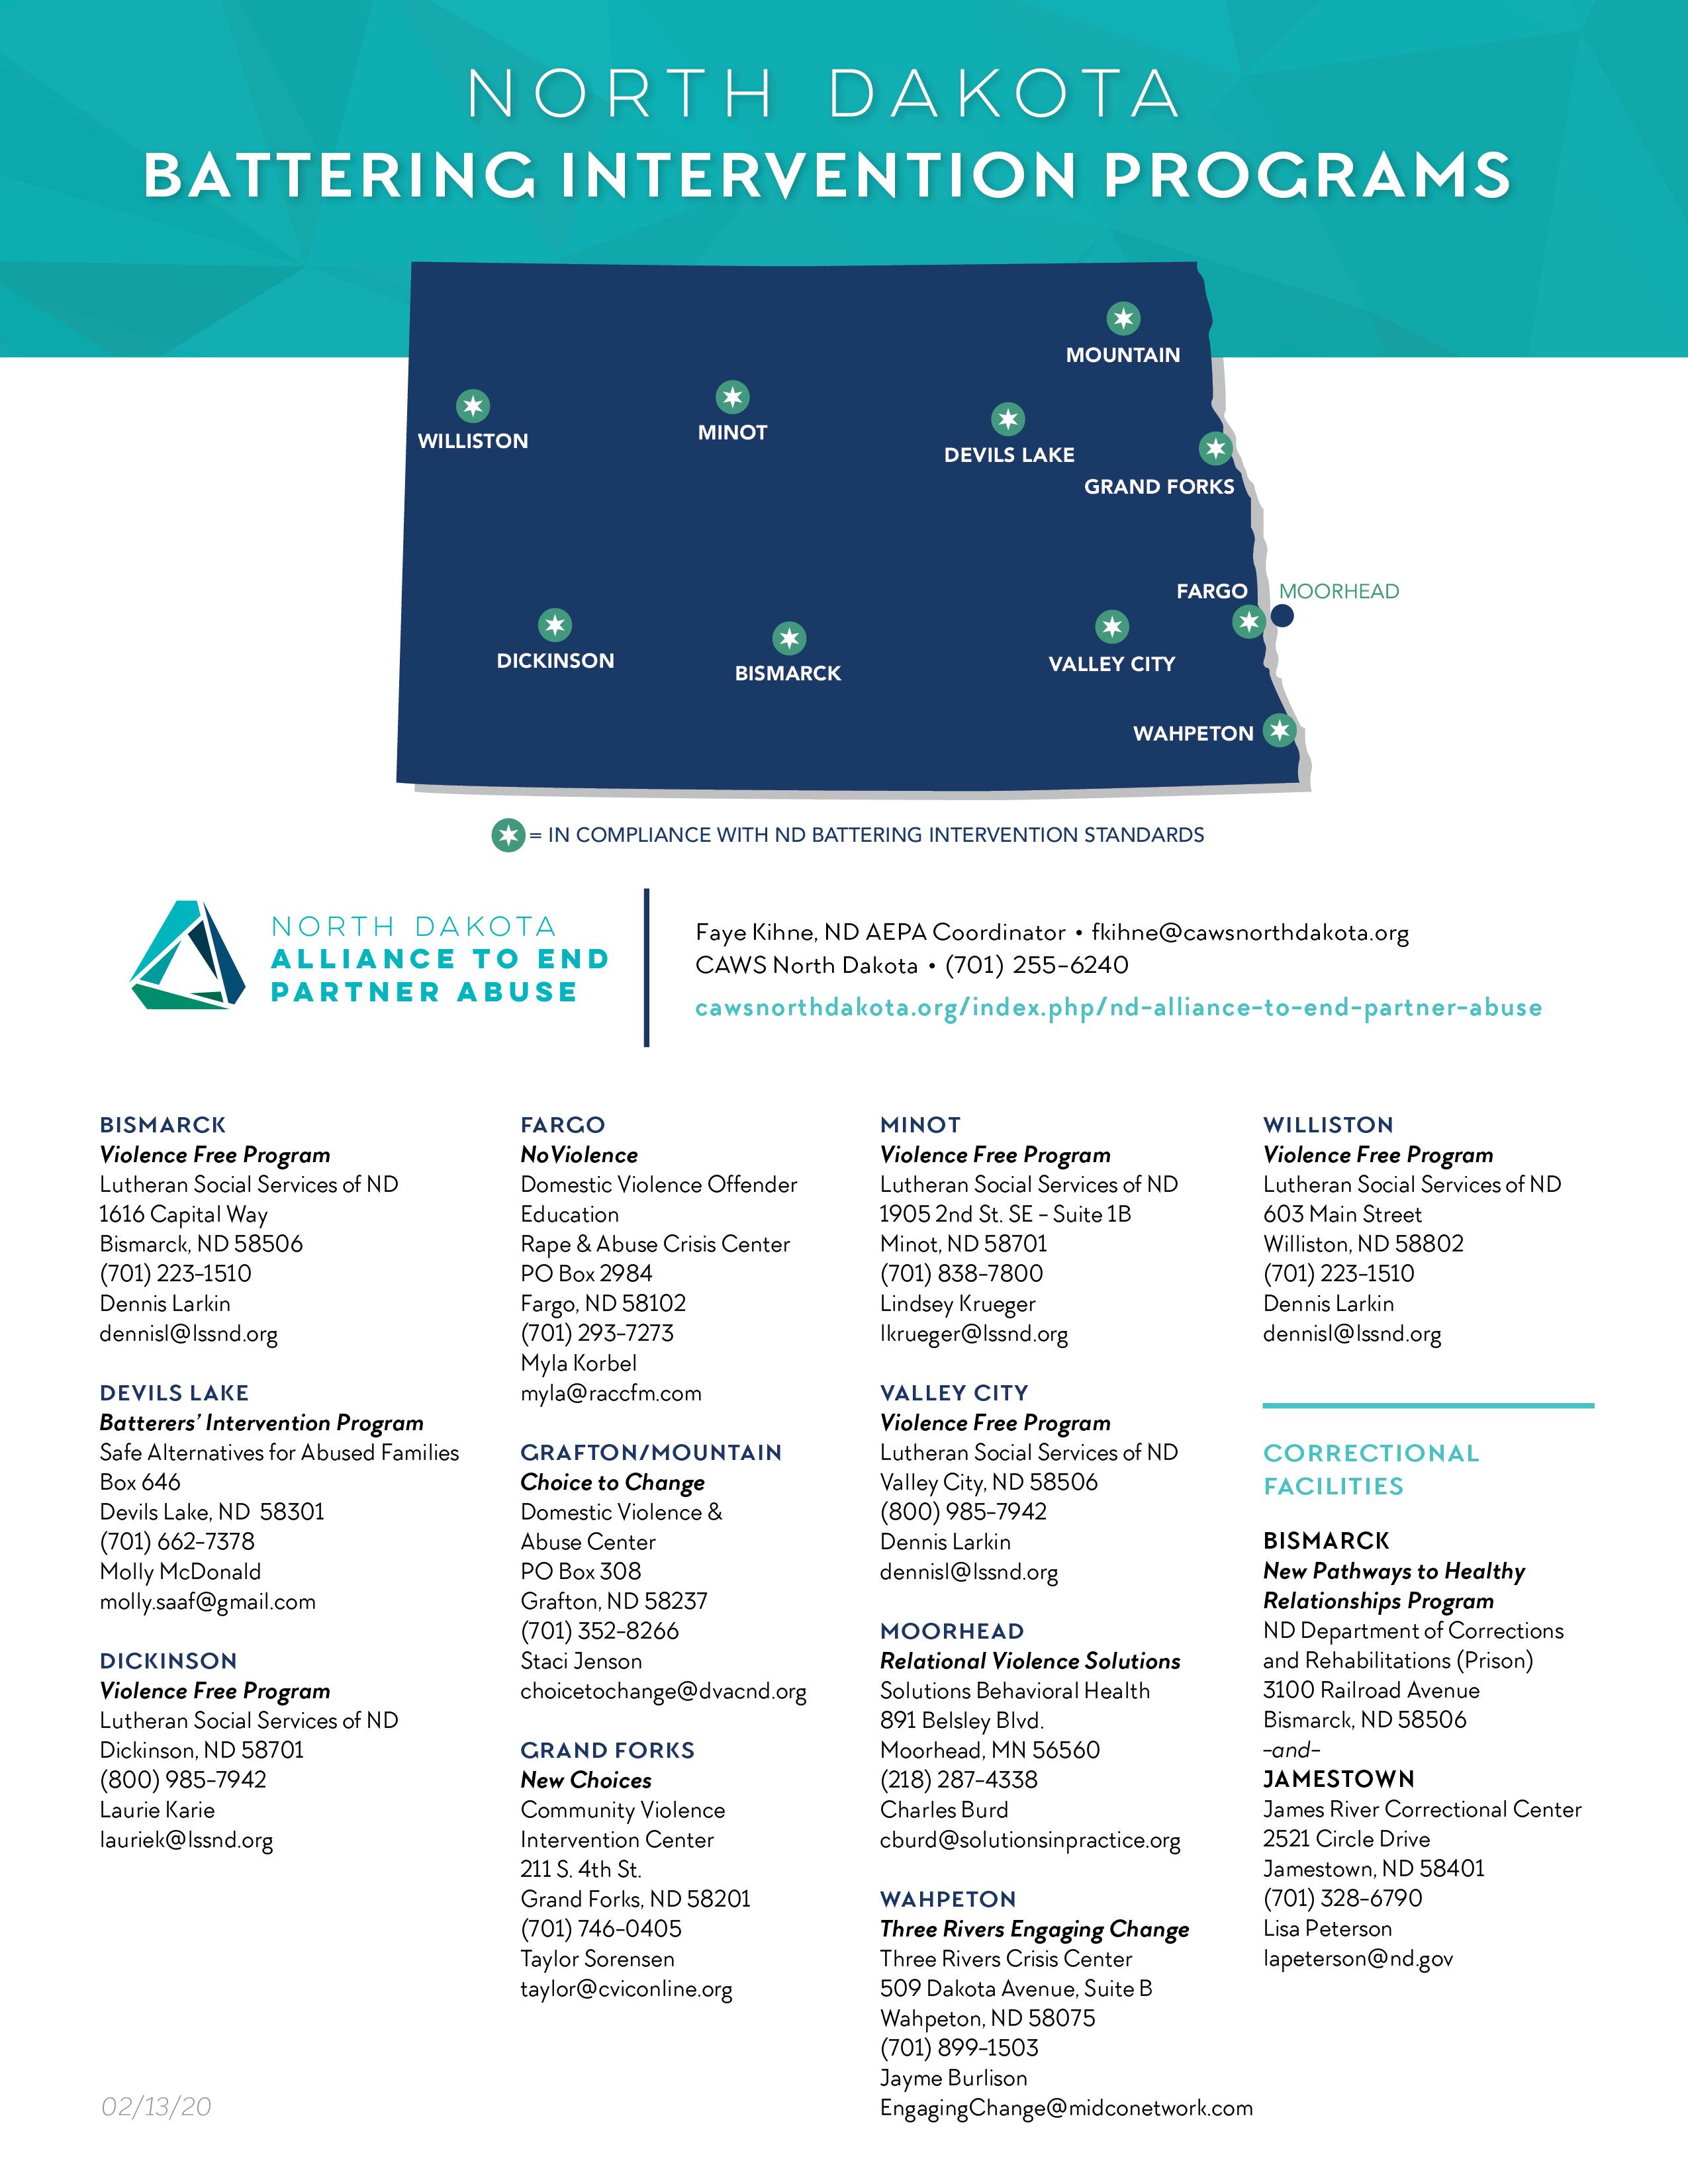 2019 BIP Program Map & Listing